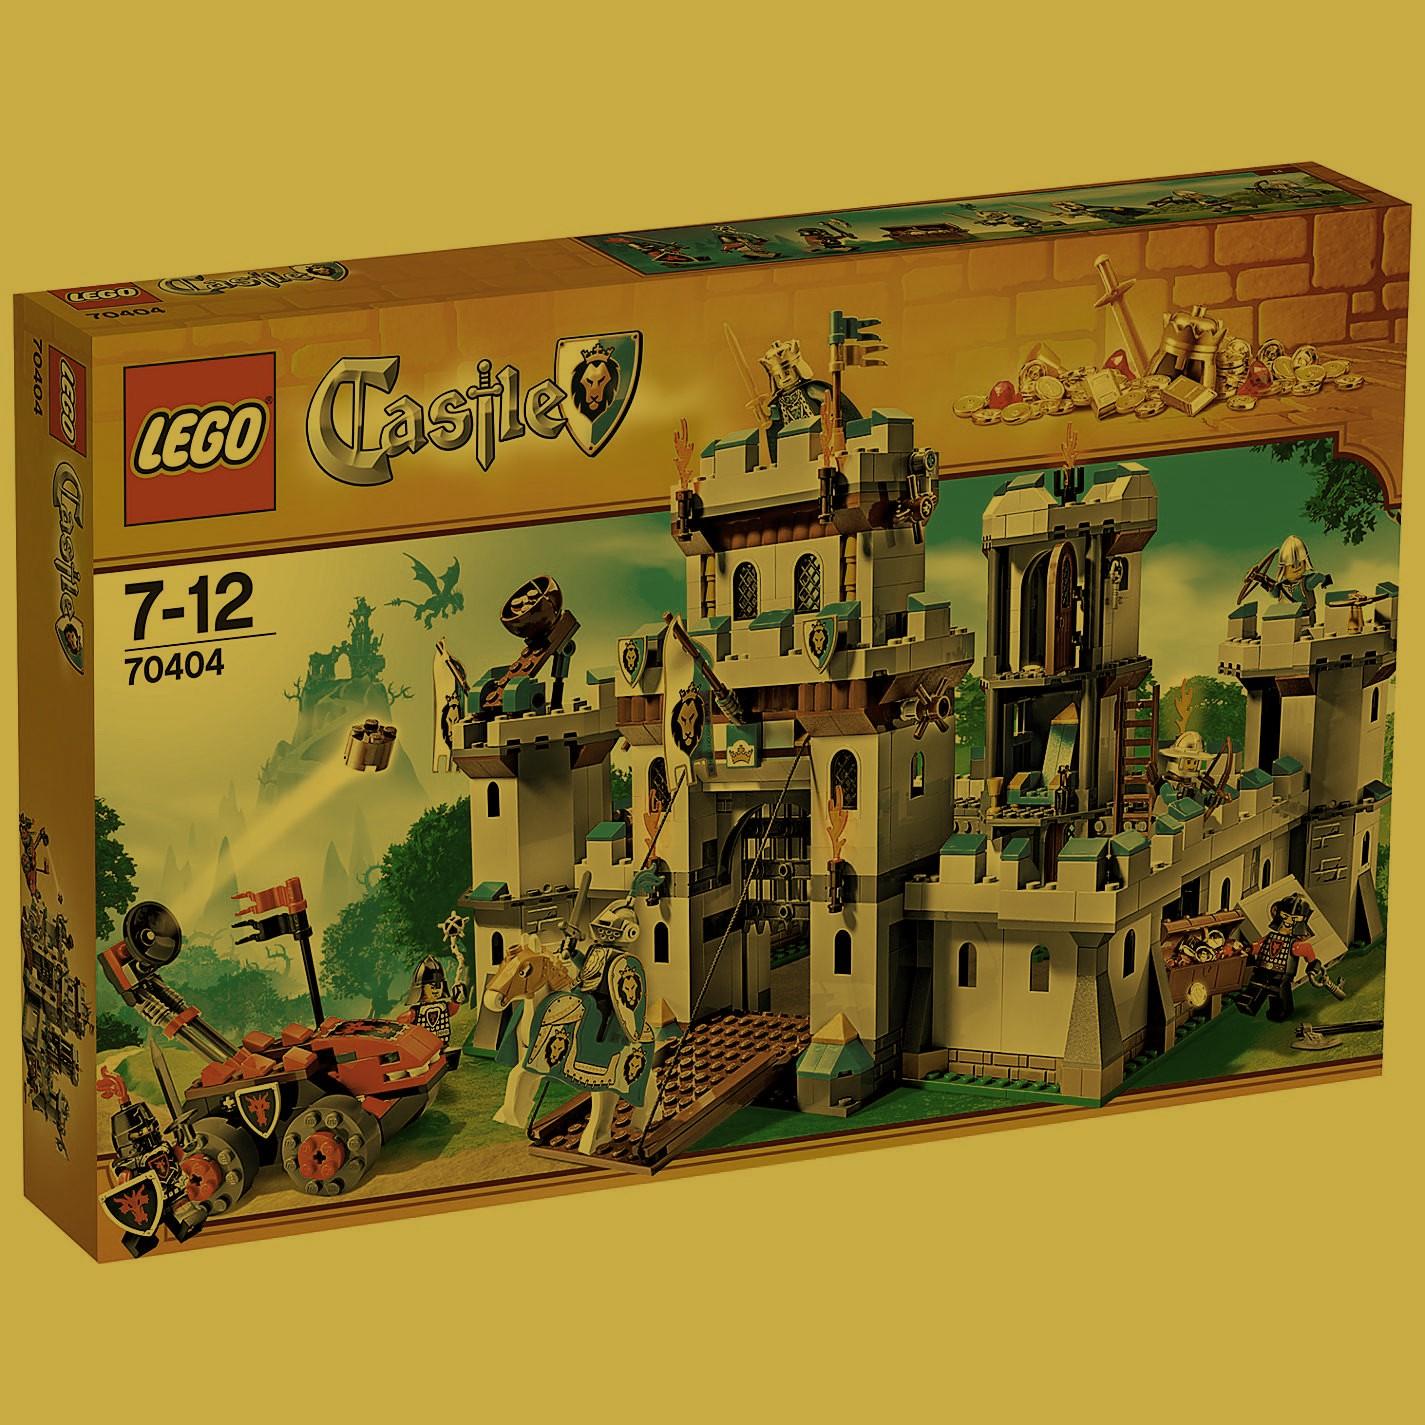 Product And The Art Of Lego John Larkin Medium